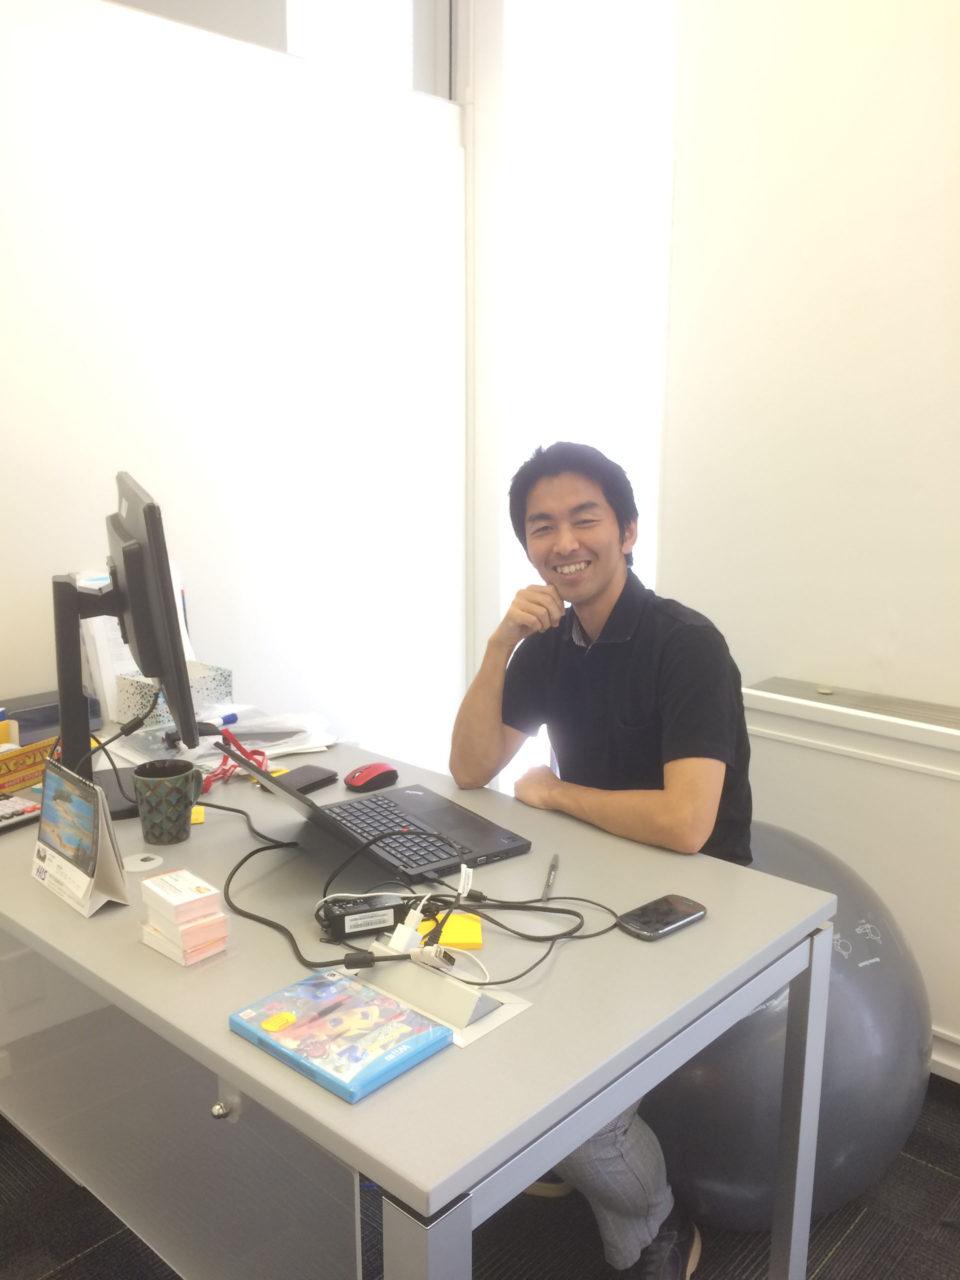 Atsuo-Nakayama-featured-image-960x1280.jpg